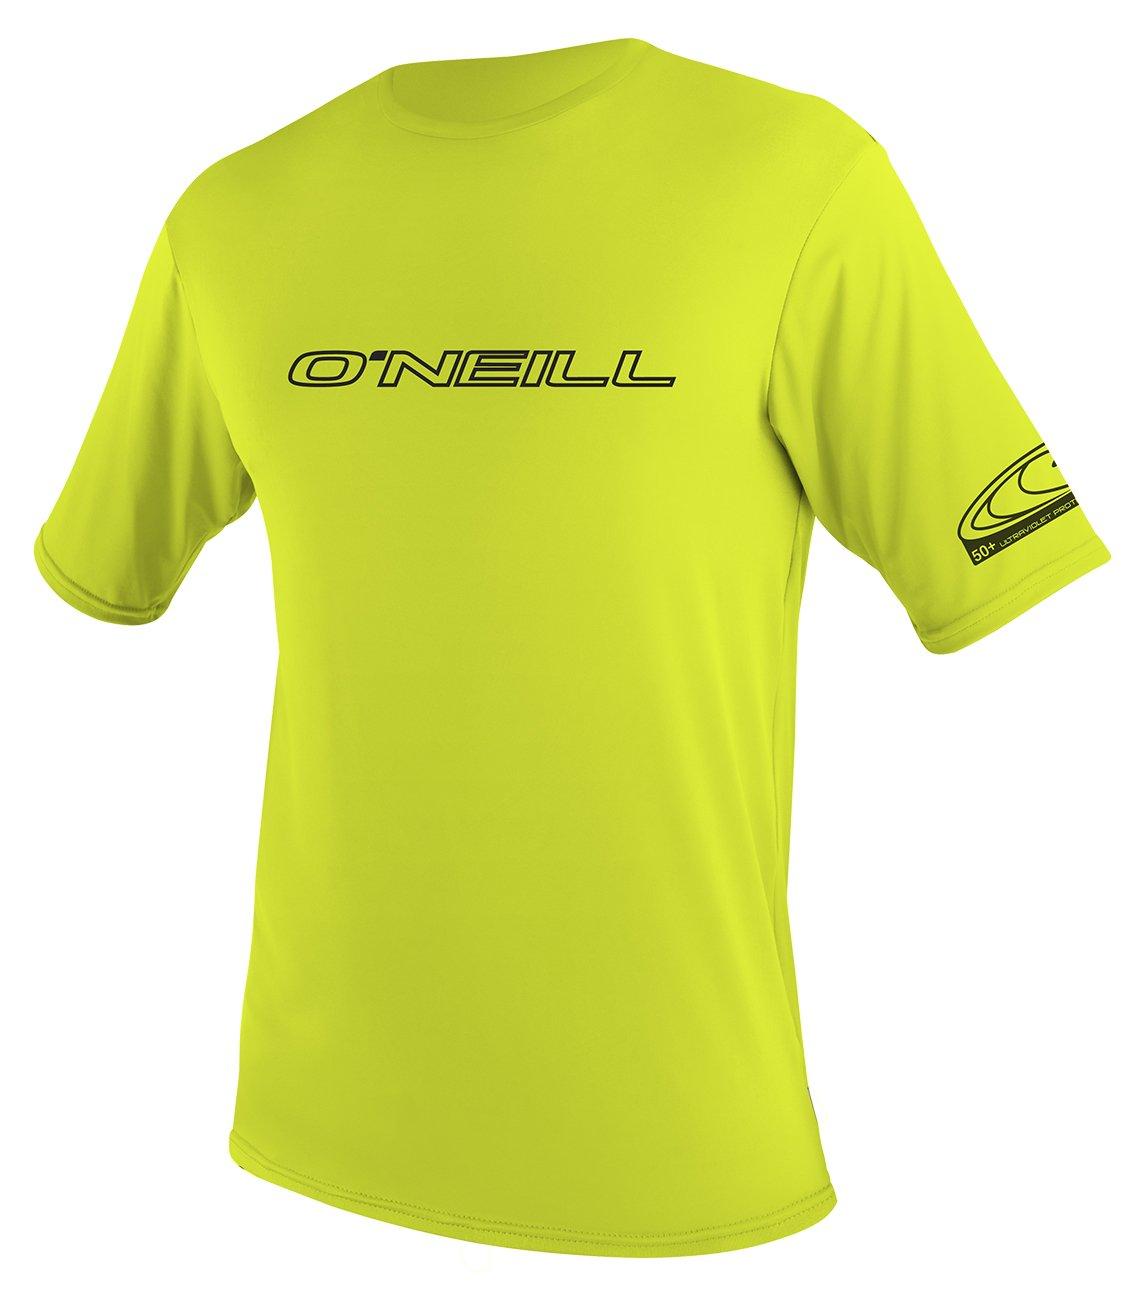 O'Neill UV 50+ Sun Protection Youth Basic Skins Short Sleeve Tee Sun Shirt Rash Guard, Lime, 6